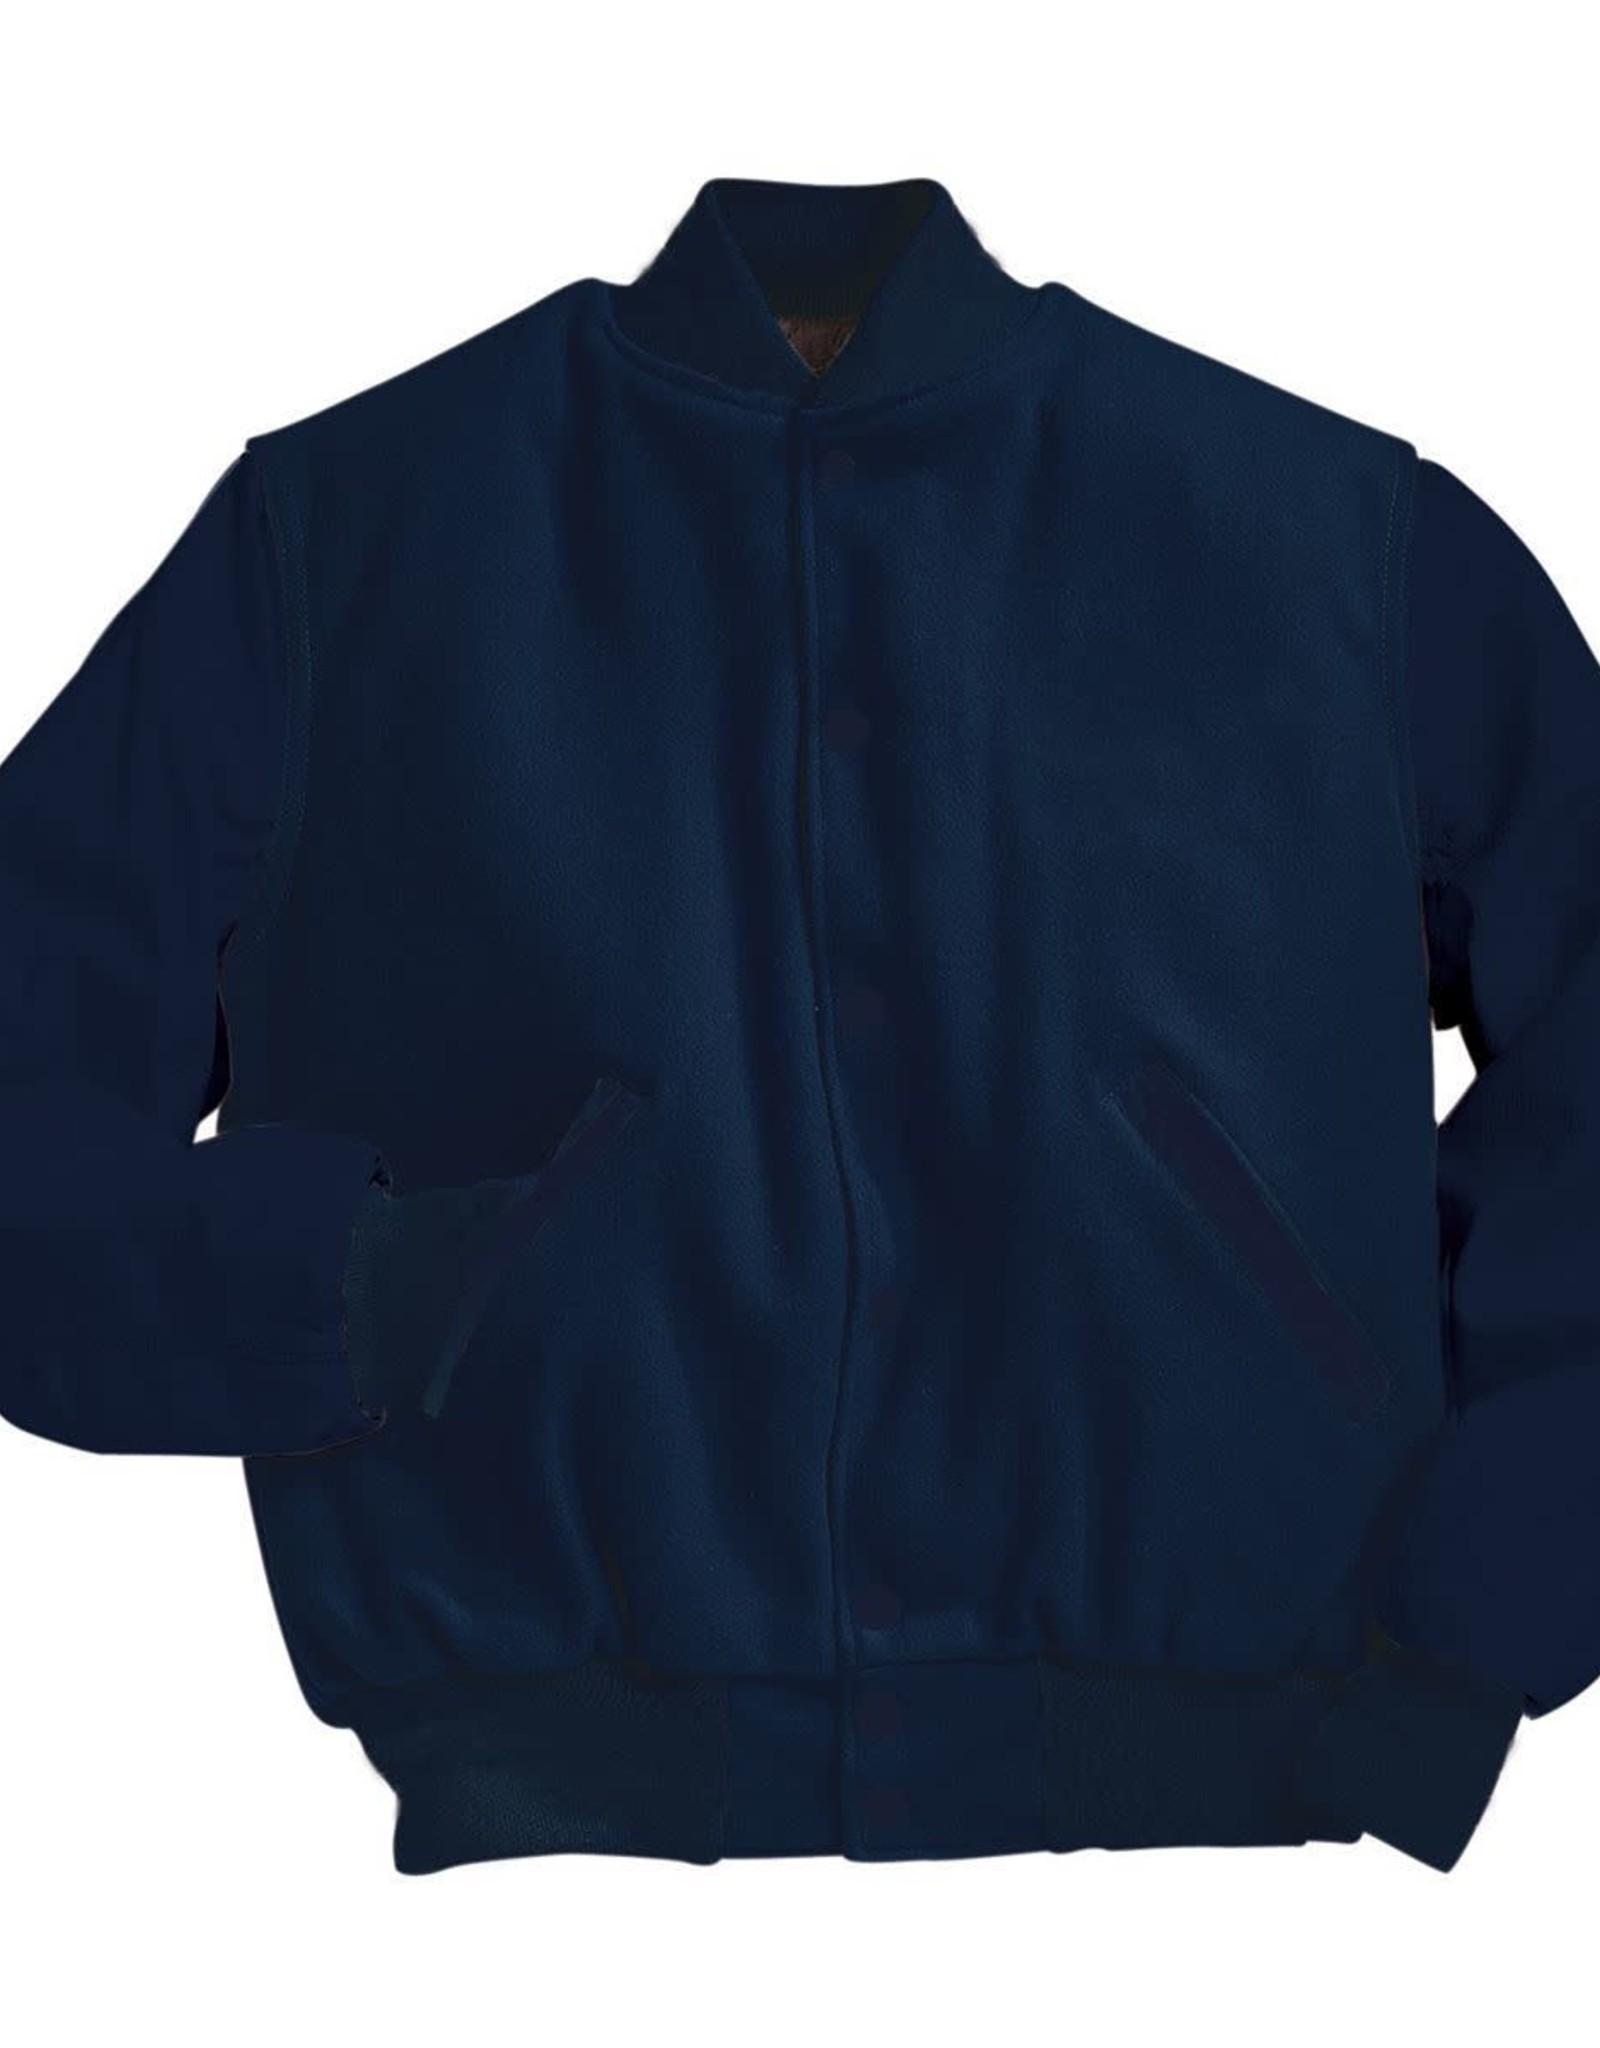 NON-UNIFORM JD Custom Leather/Wool Jacket